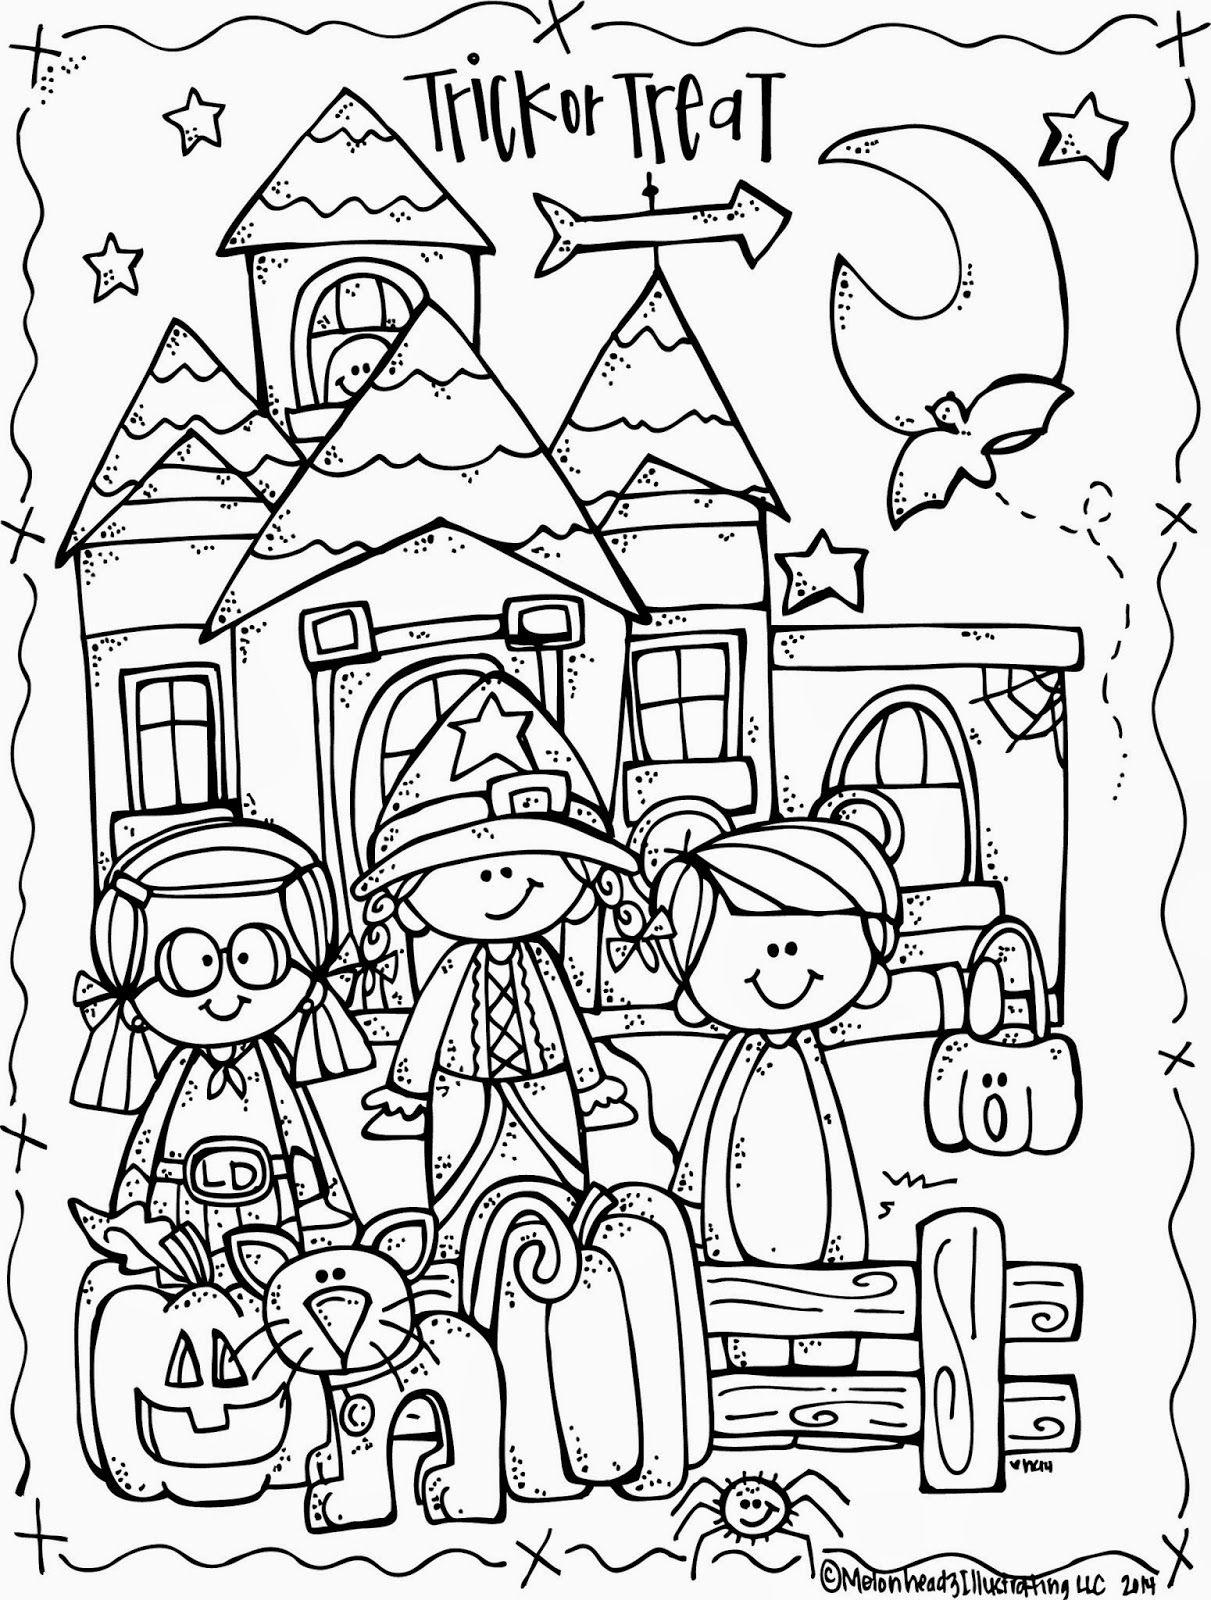 Happy Halloween! xox | Coloring pages | Pinterest | Brujas, Colegios ...